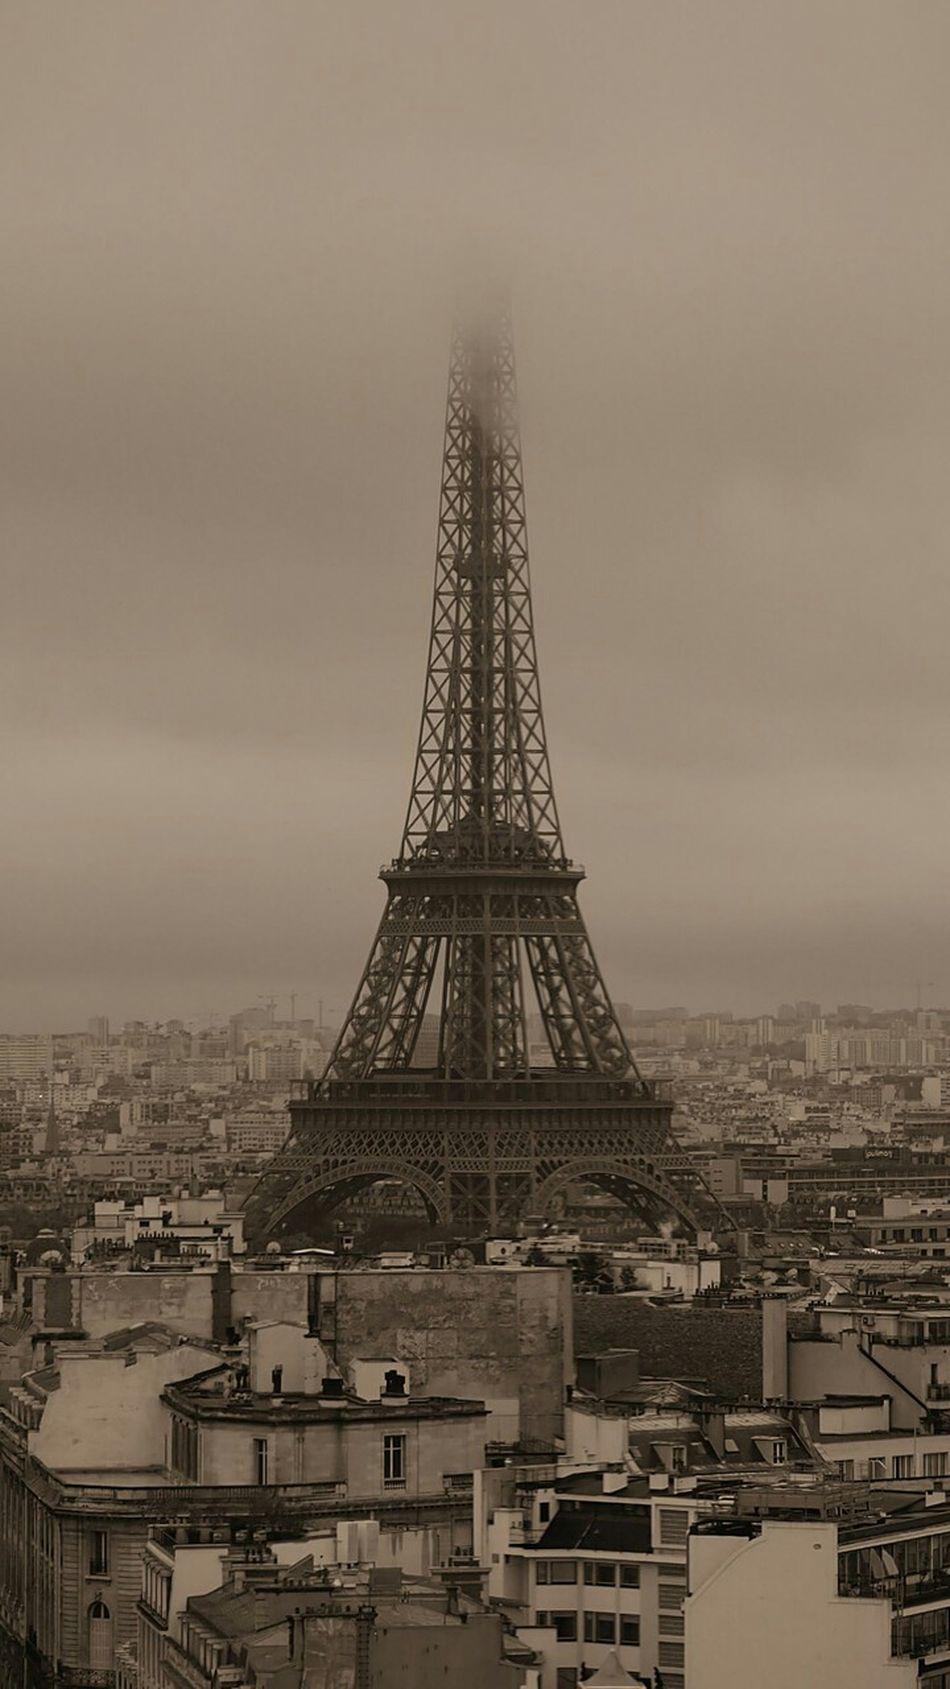 Paris ❤, Effel Tower, Black & White, Beautiful View ❤, City, Traveling